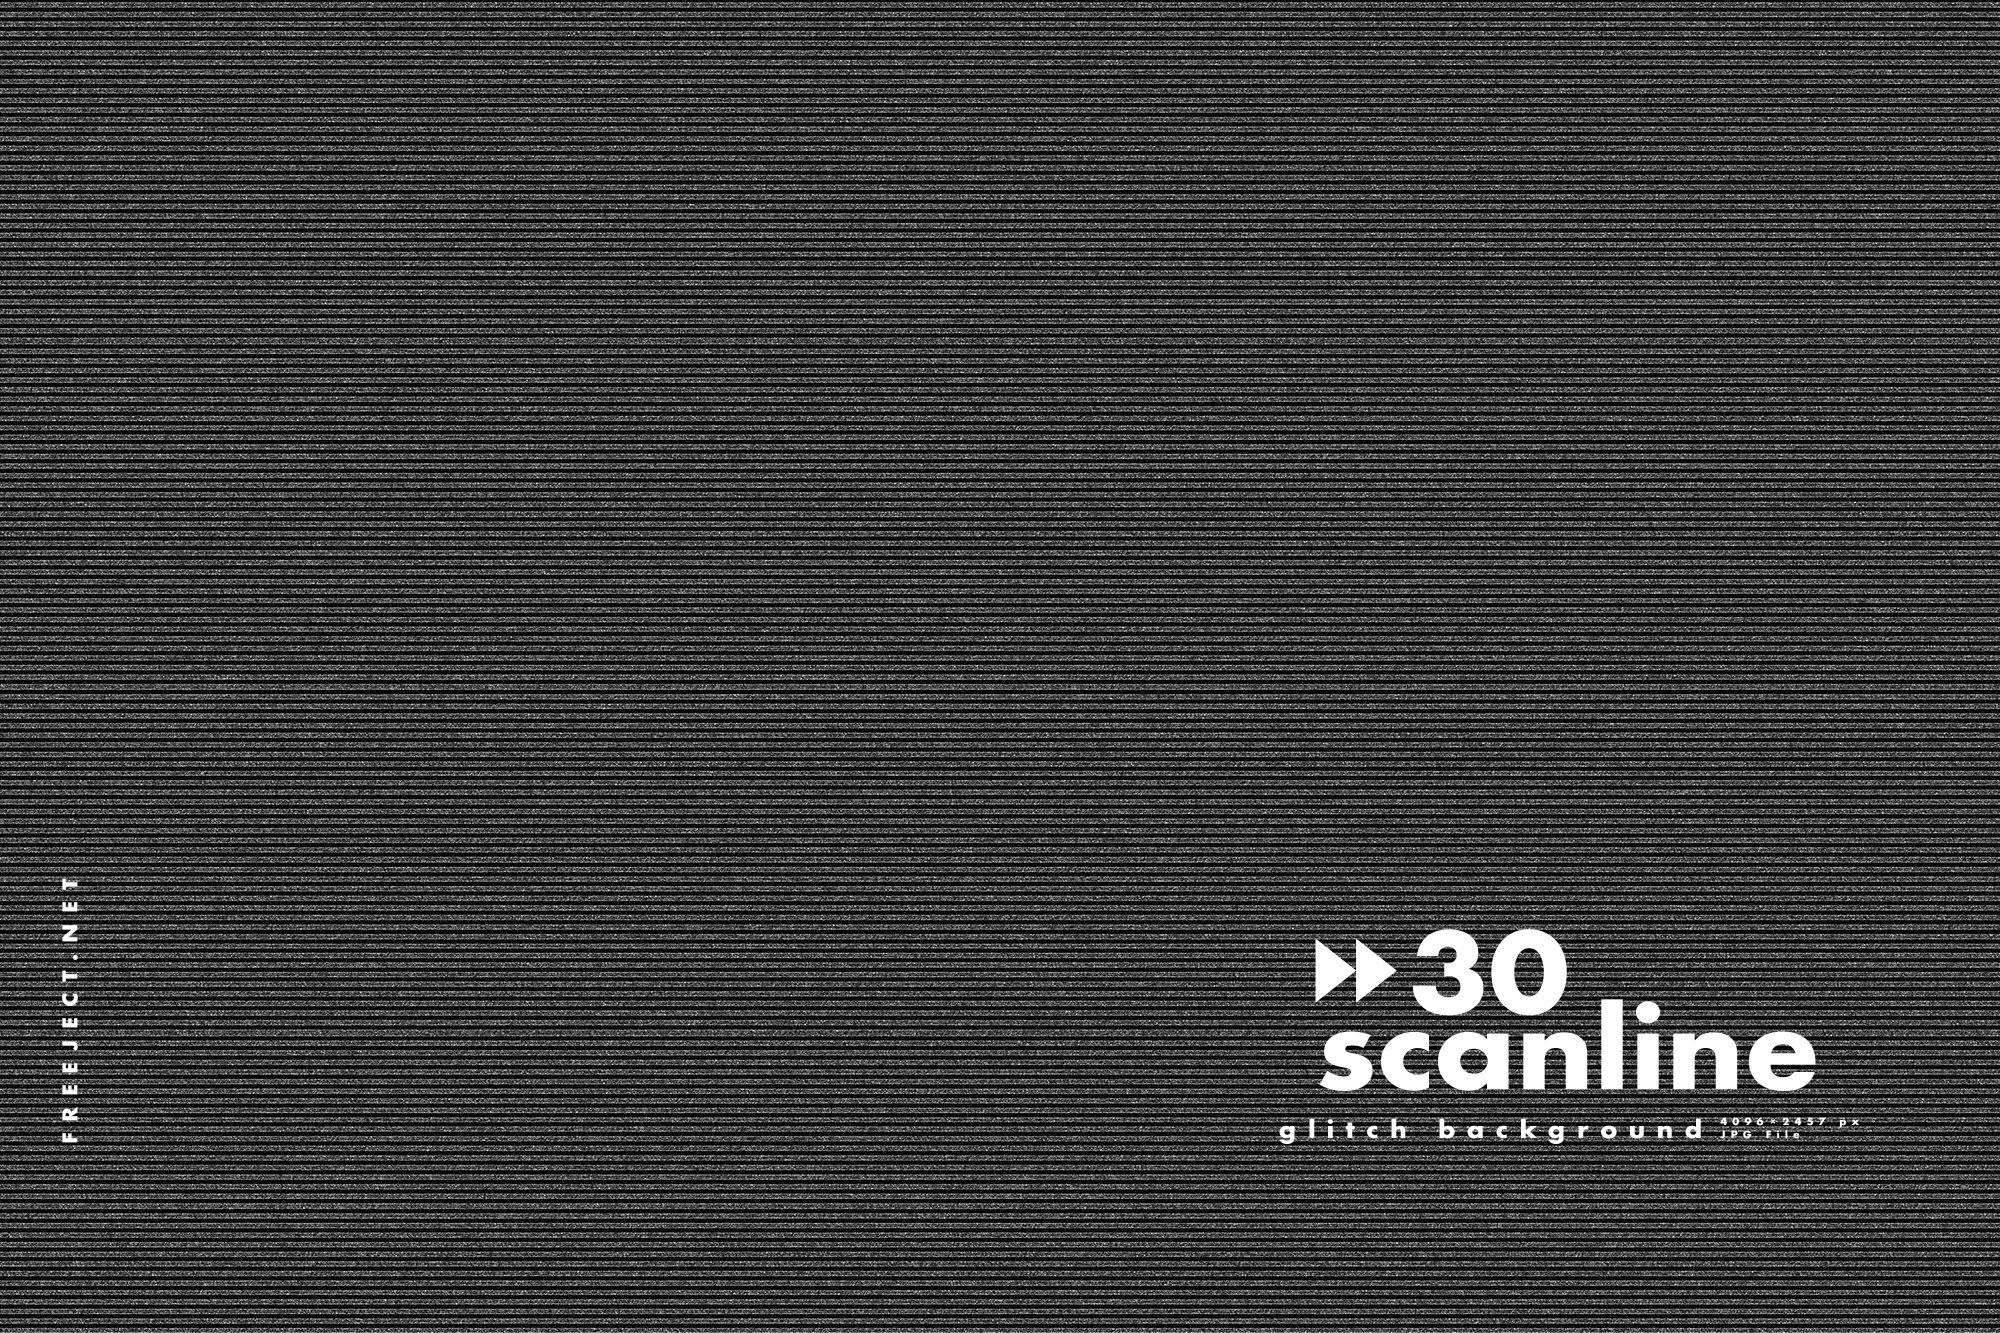 30 Scan Lines Glitch Background Glitch Creative Words Line Background